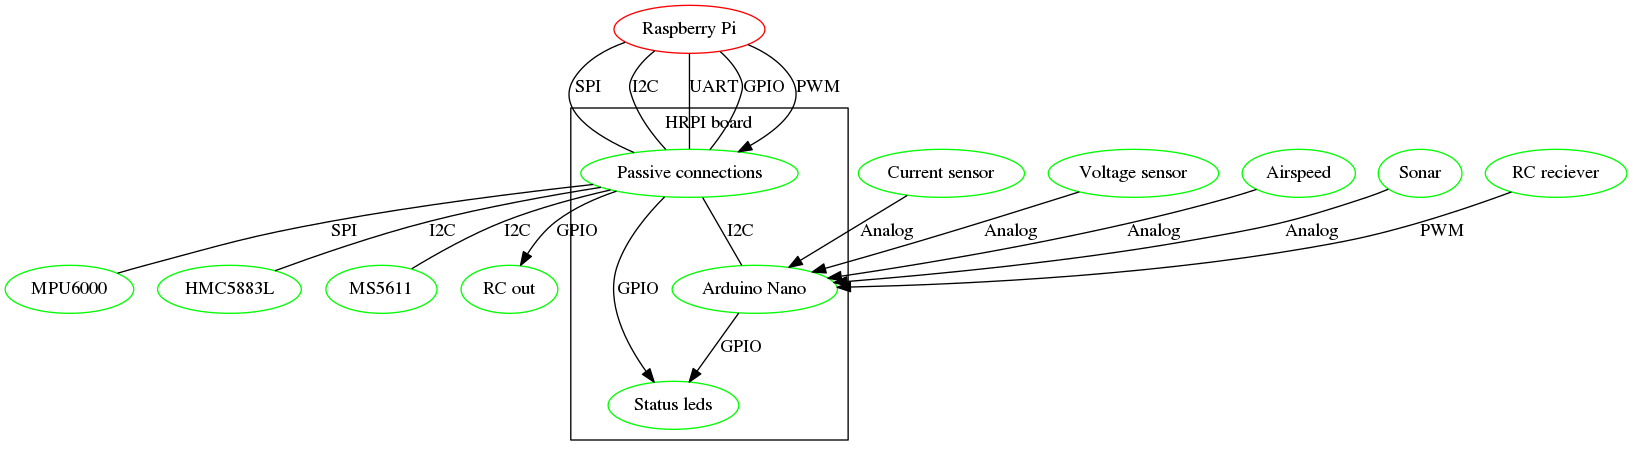 GitHub - VladimirP1/hardware-hrpi